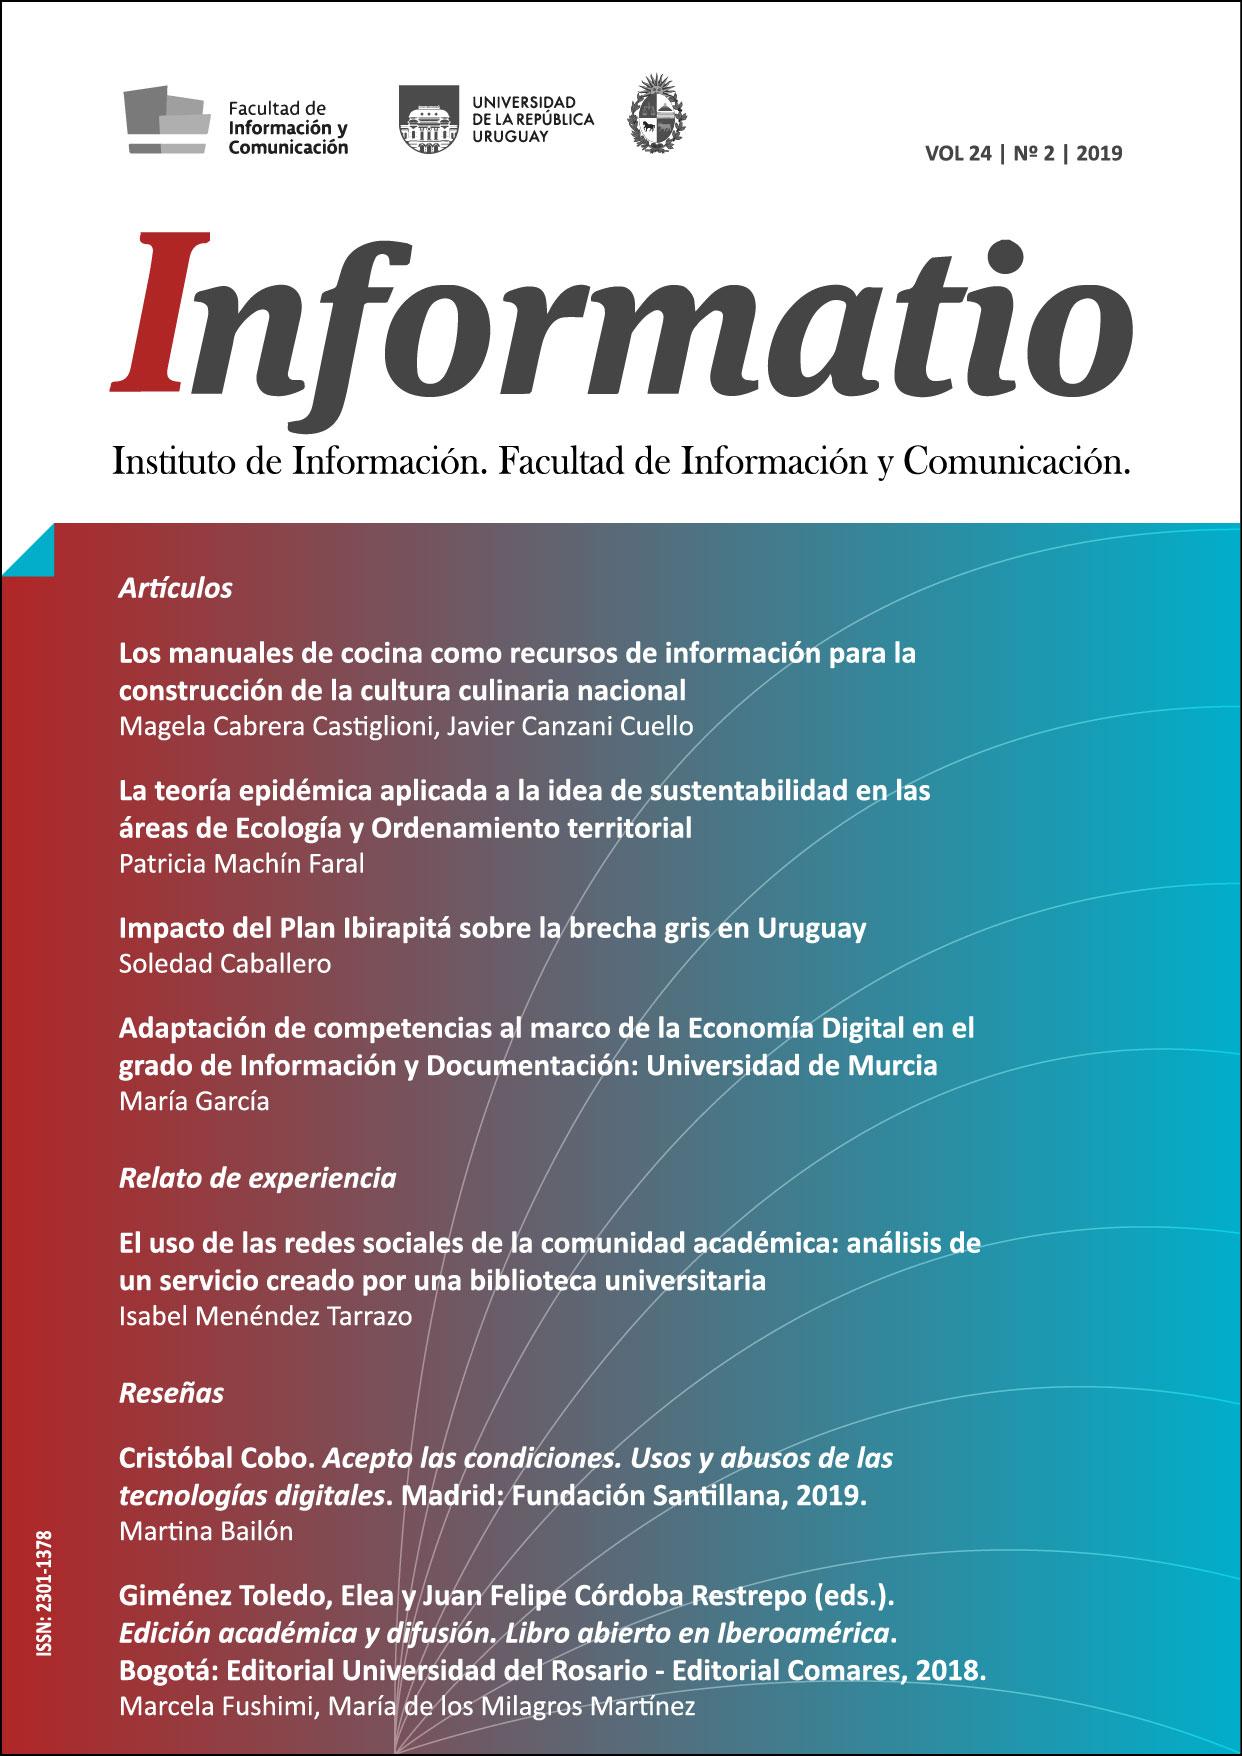 portada volumen 24, número 2 (diciembre 2019)